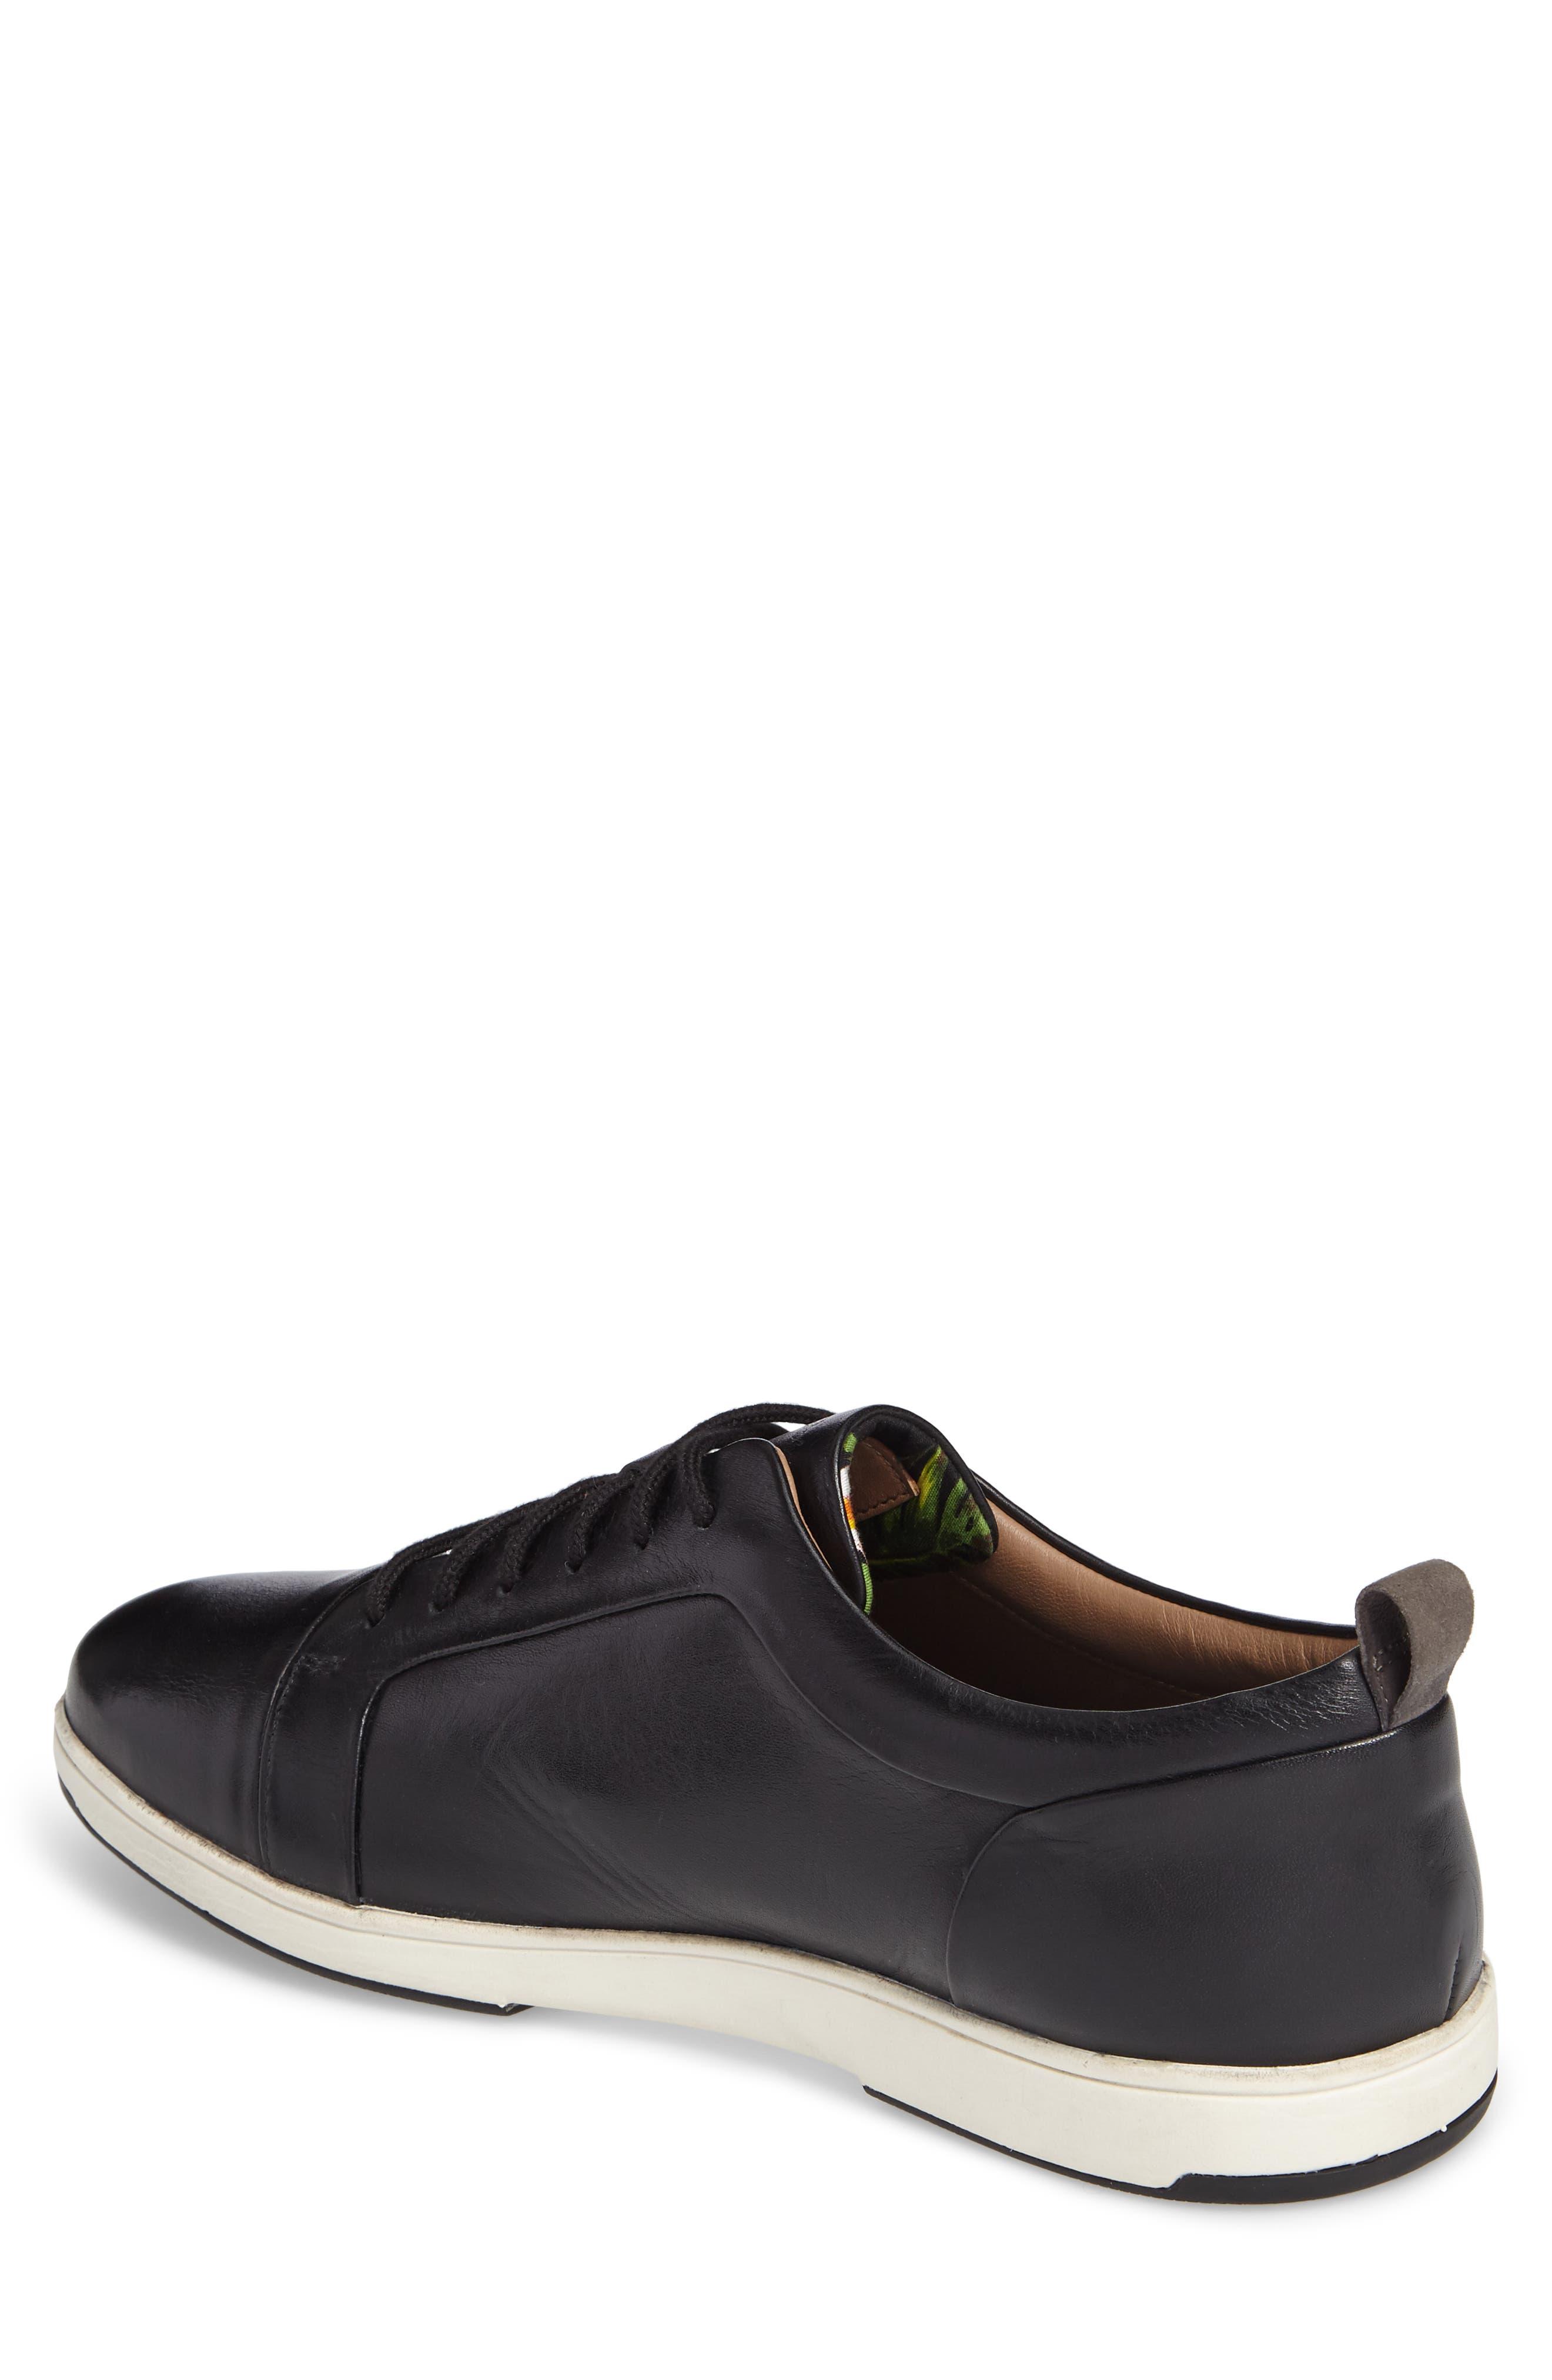 Cadiz Sneaker,                             Alternate thumbnail 2, color,                             001